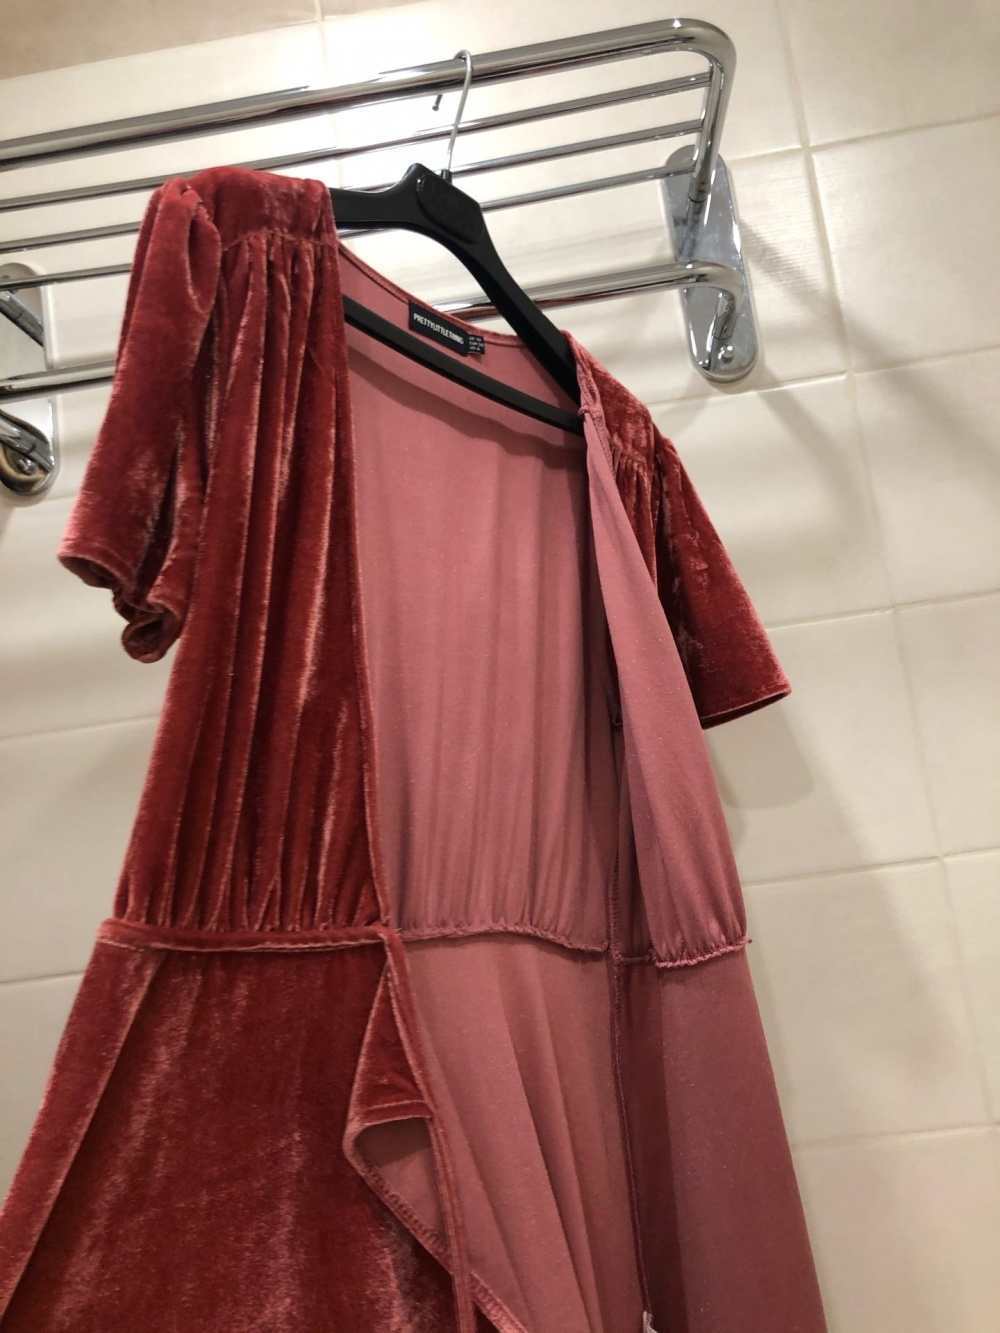 Платье PrettyLittleThing. Размер S-M.